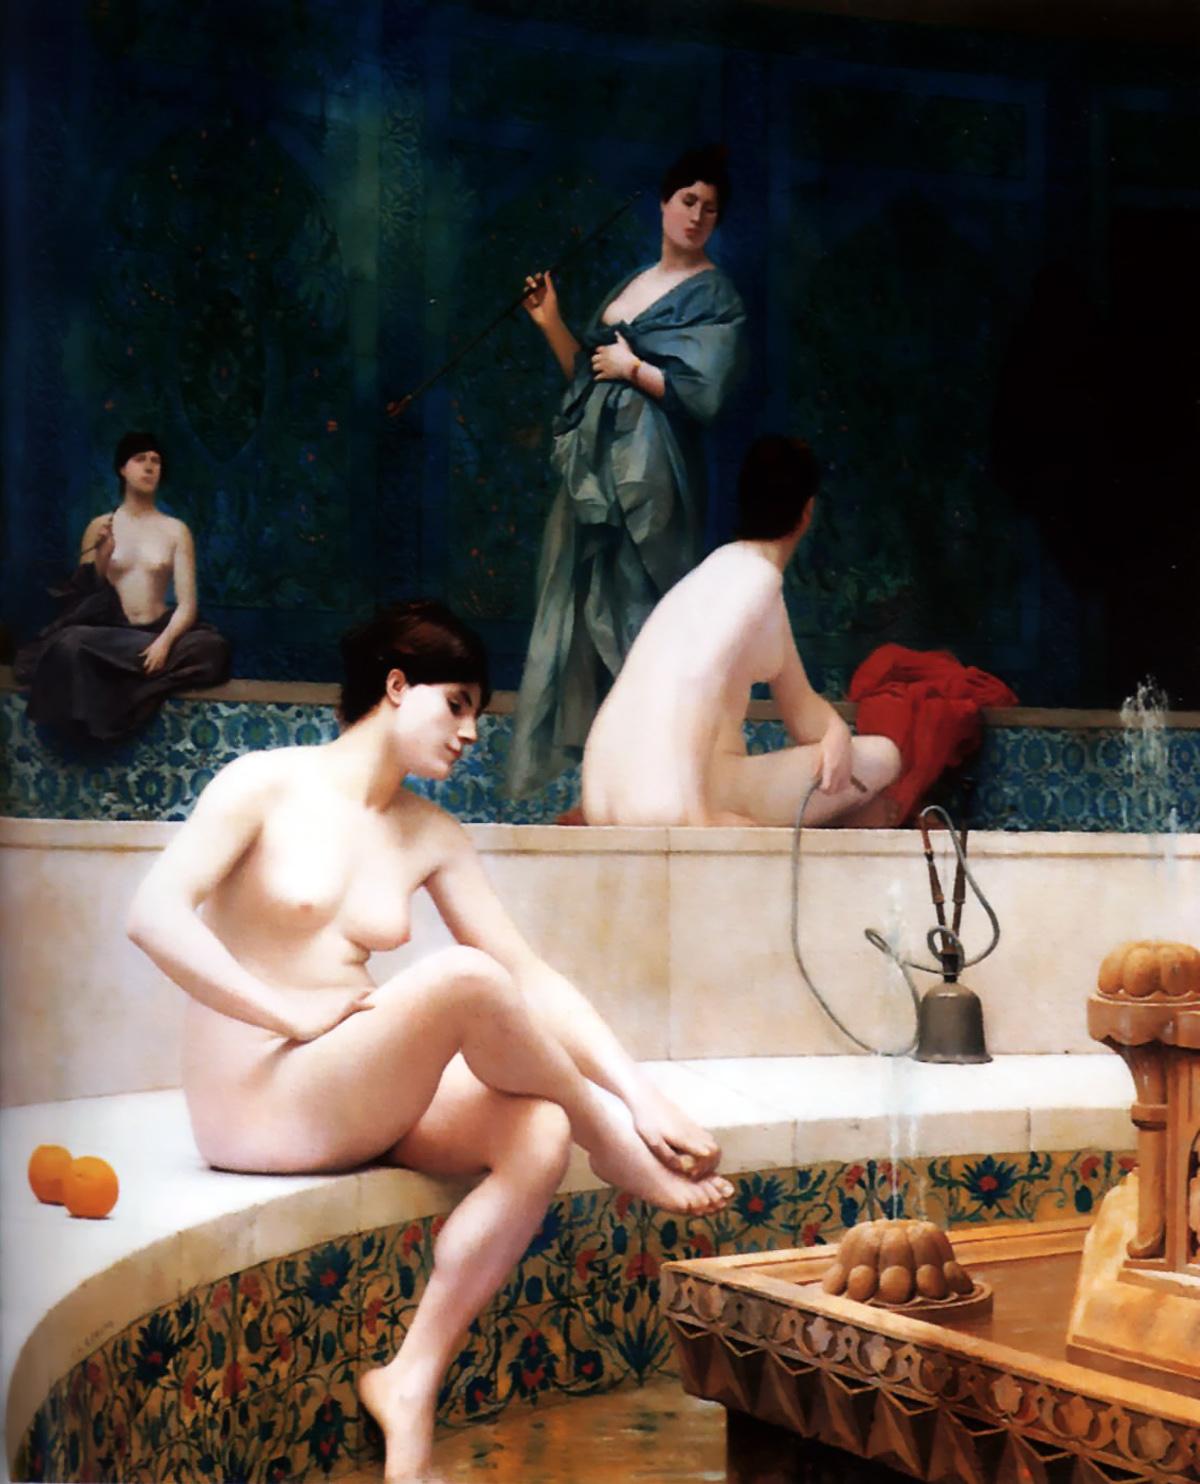 эротика в турецкой бане